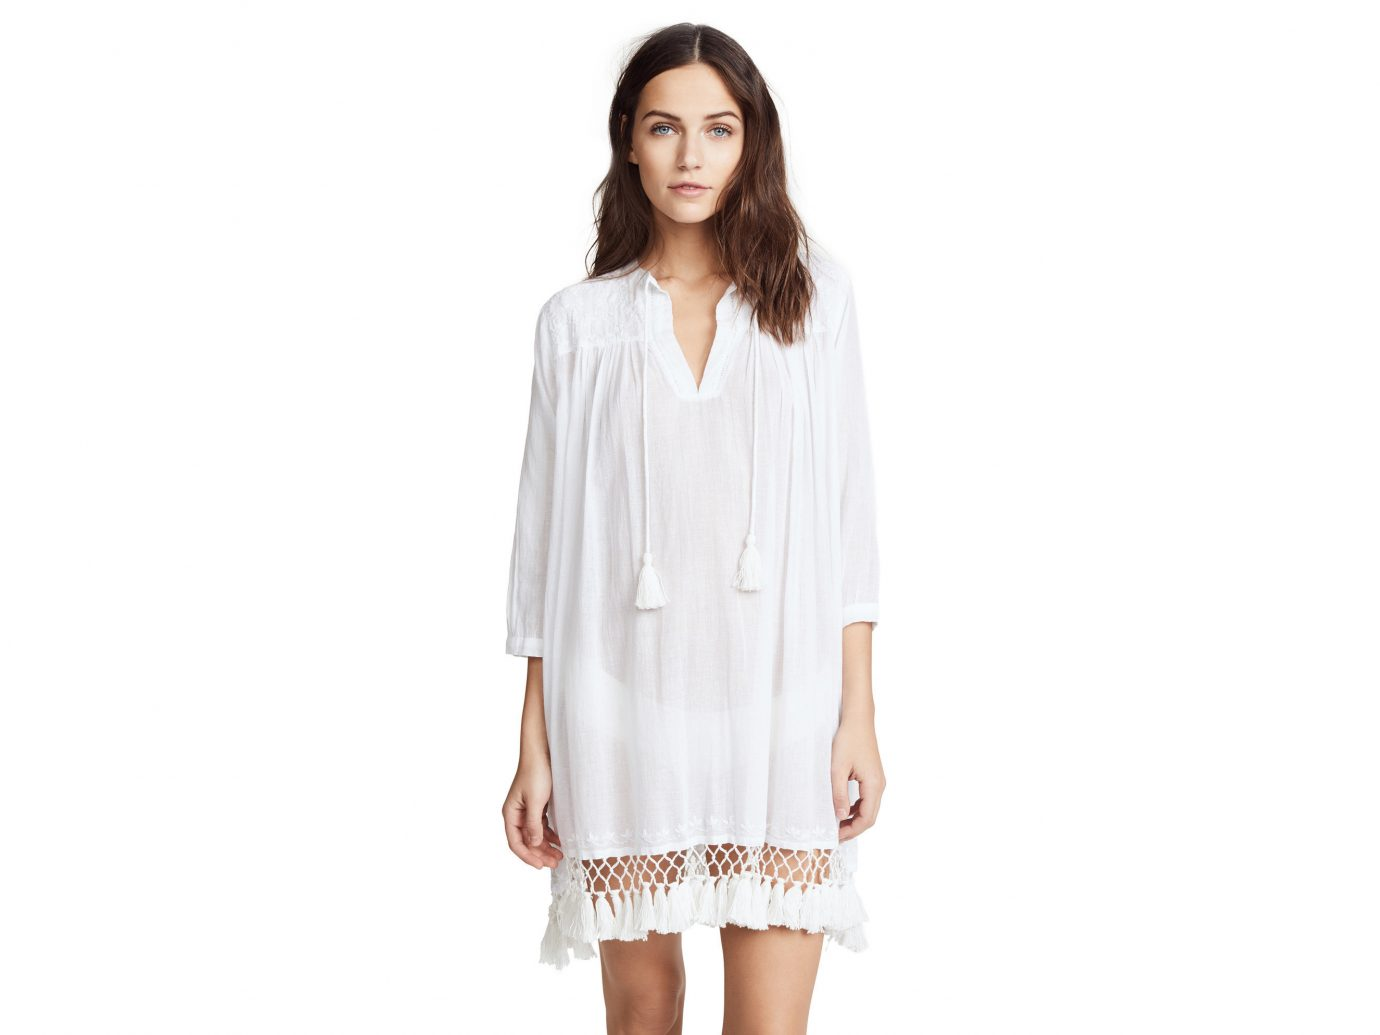 Style + Design Travel Shop clothing shoulder day dress sleeve fashion model joint neck posing blouse